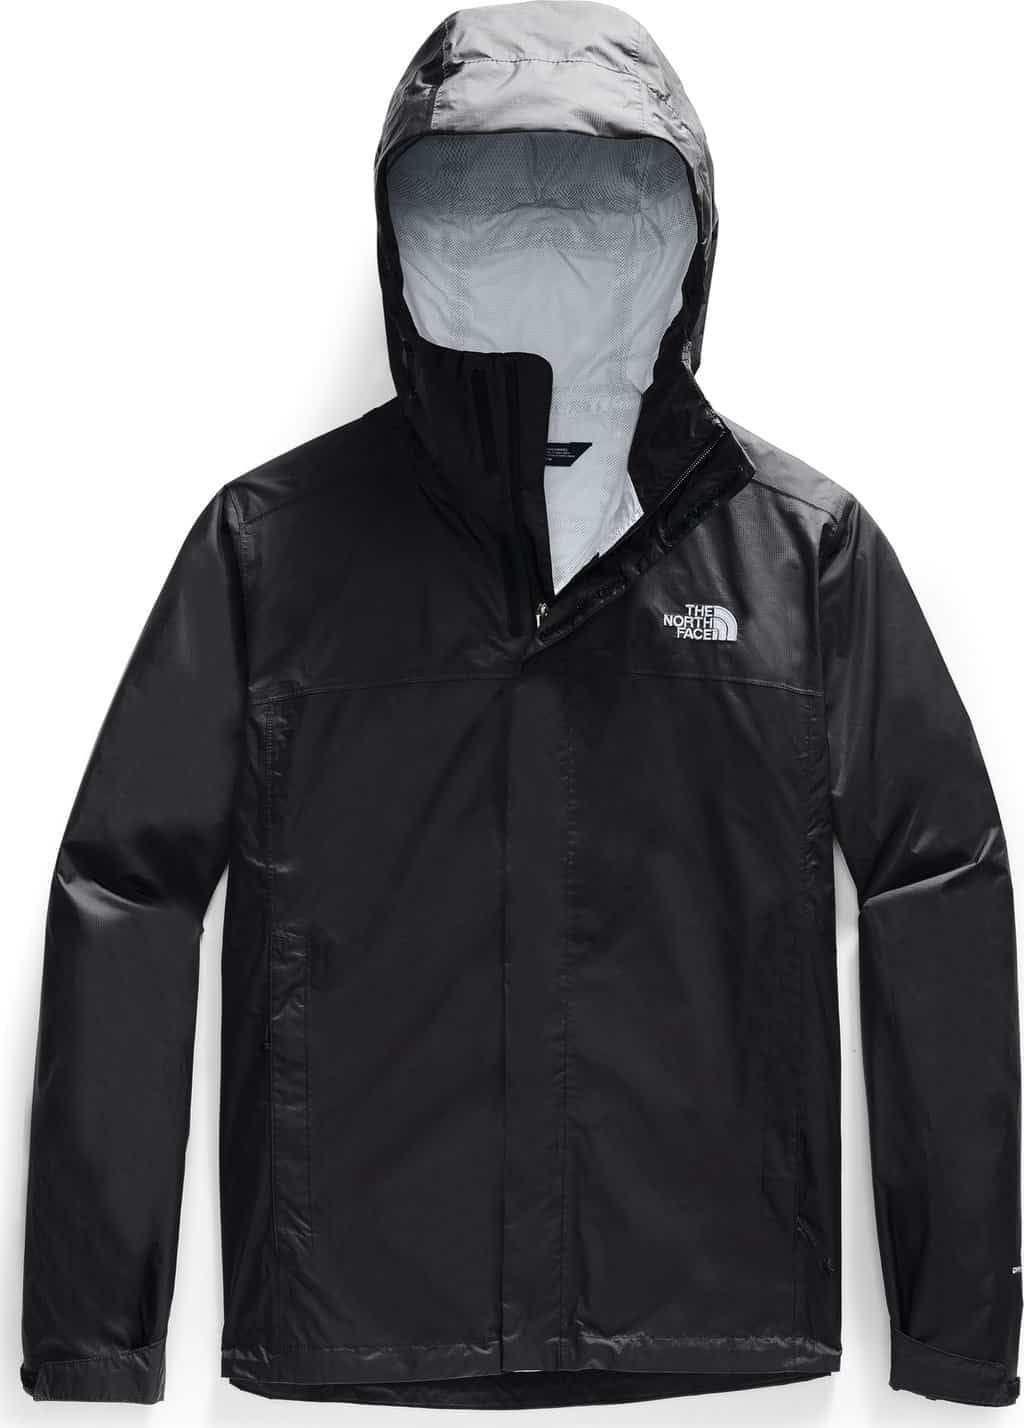 The North Face - Manteau Venture 2 - Homme